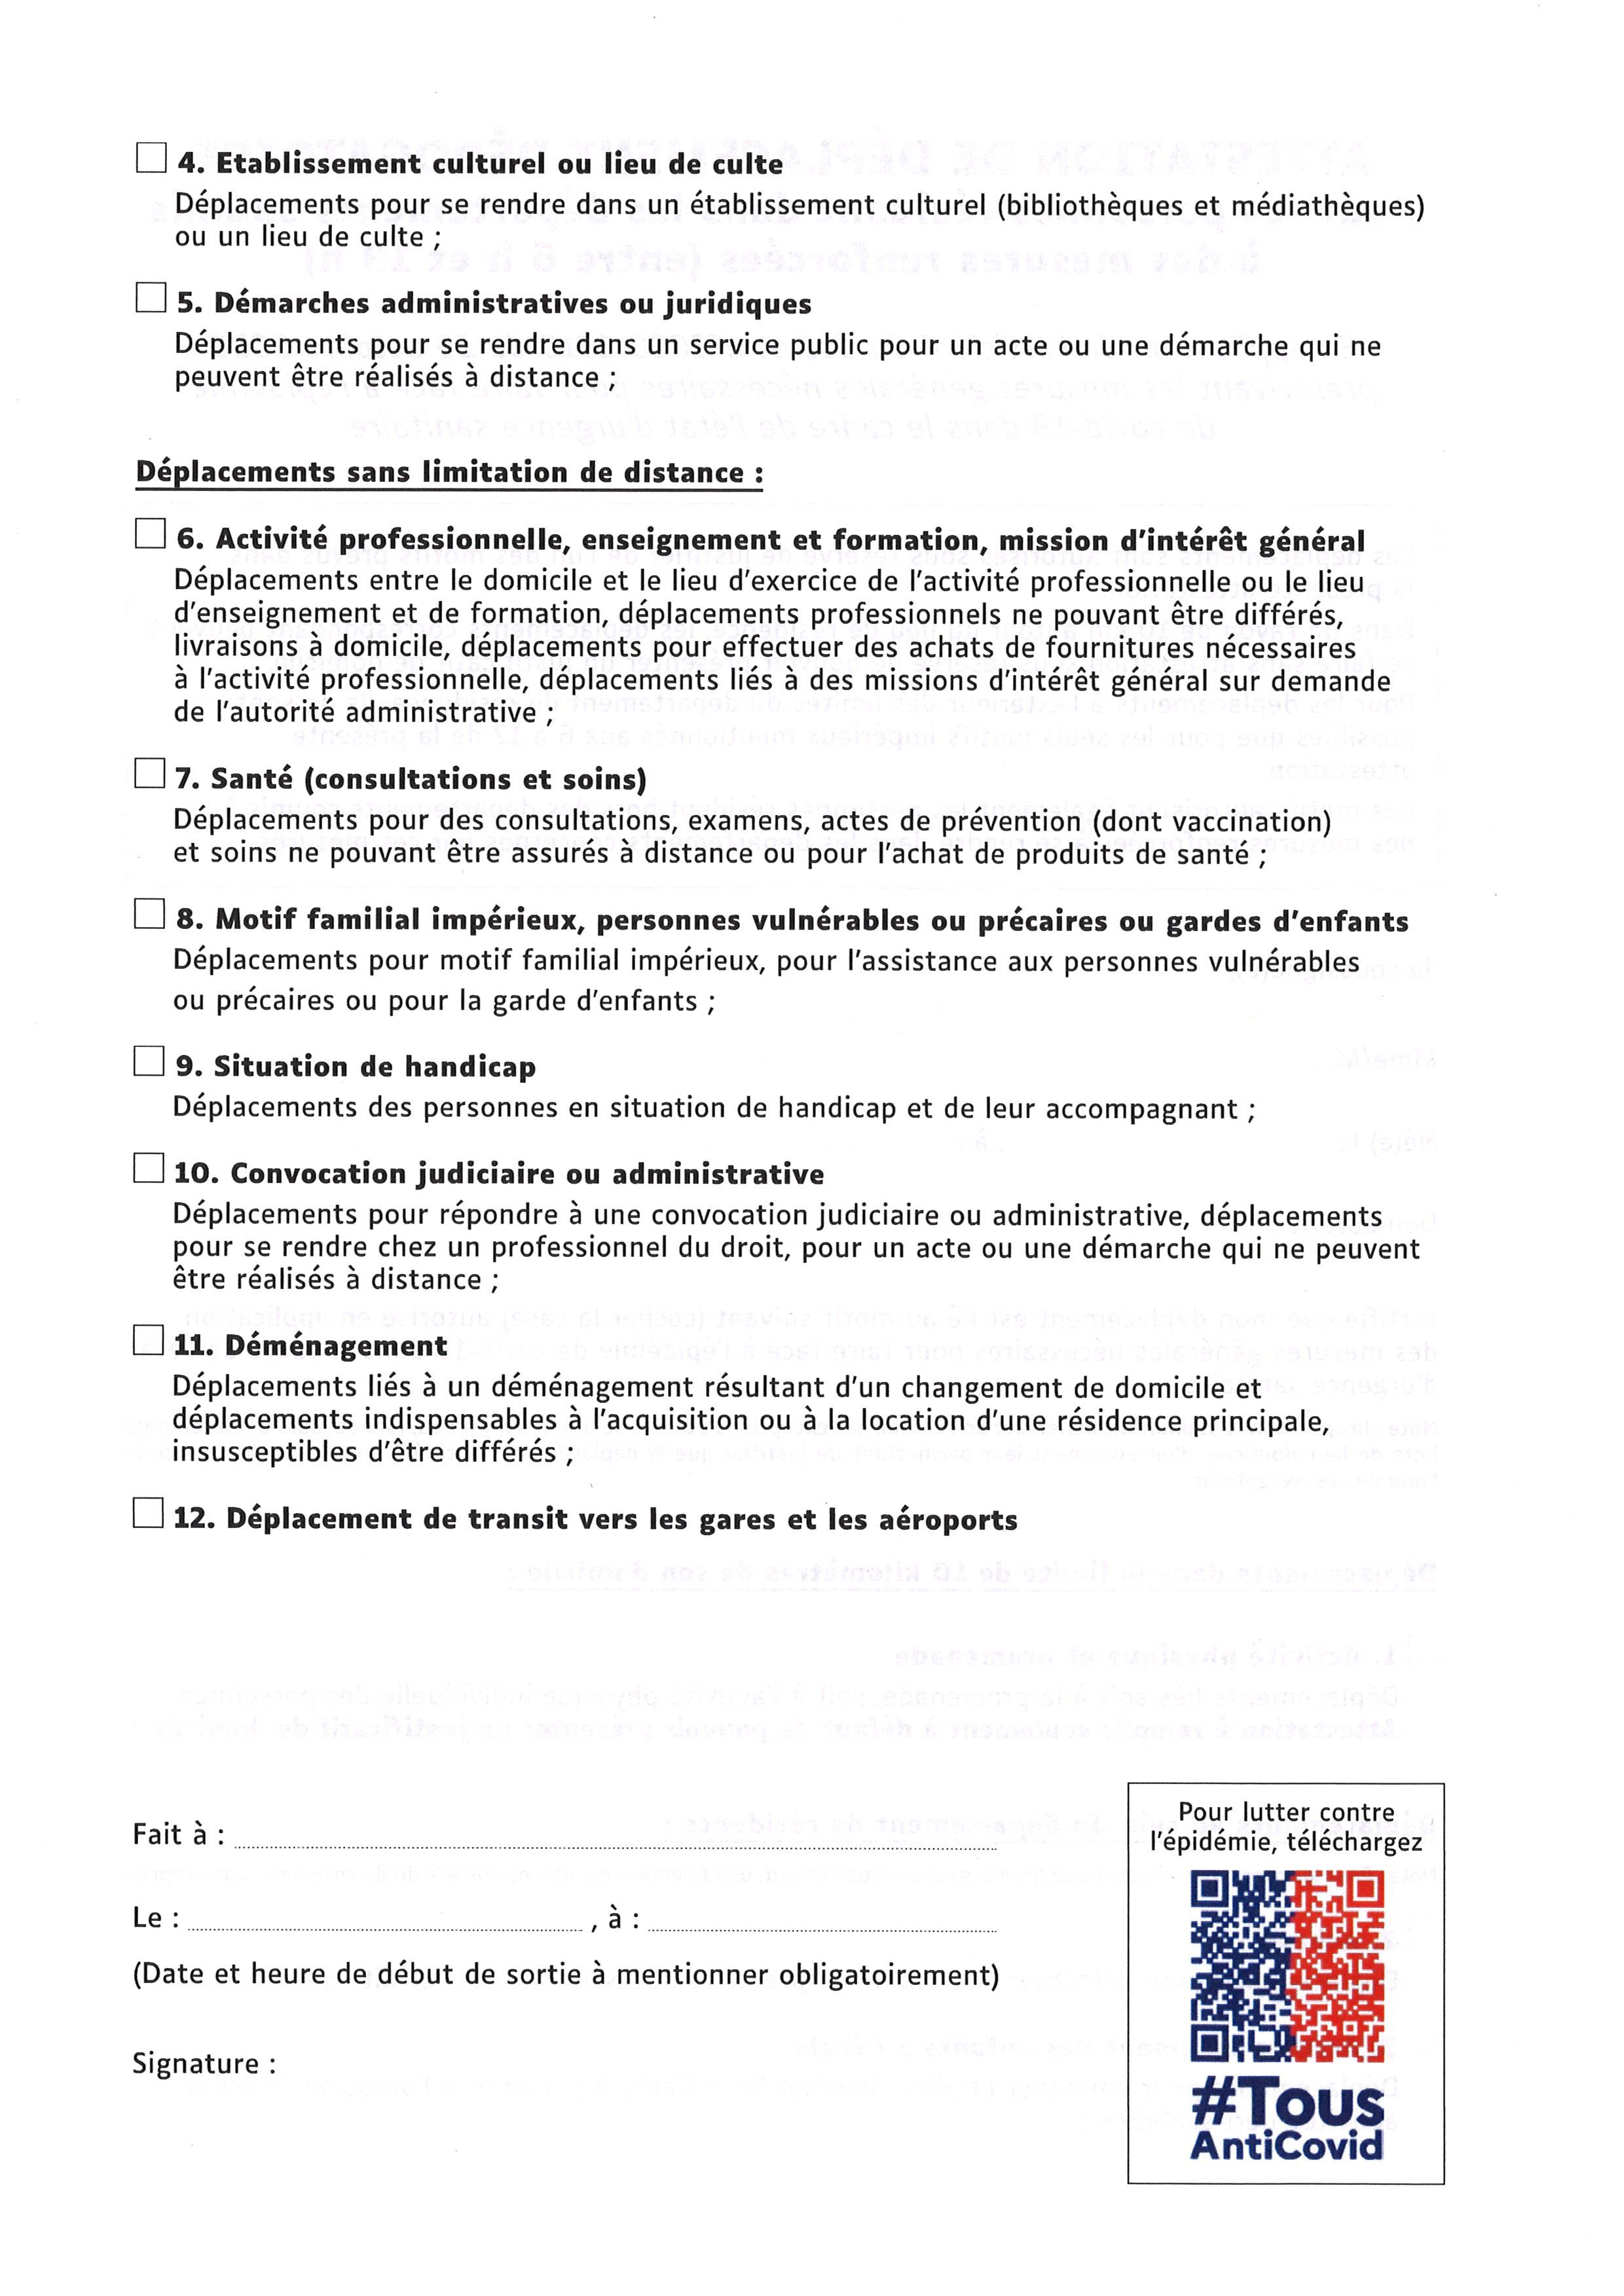 attest pg 2.jpg